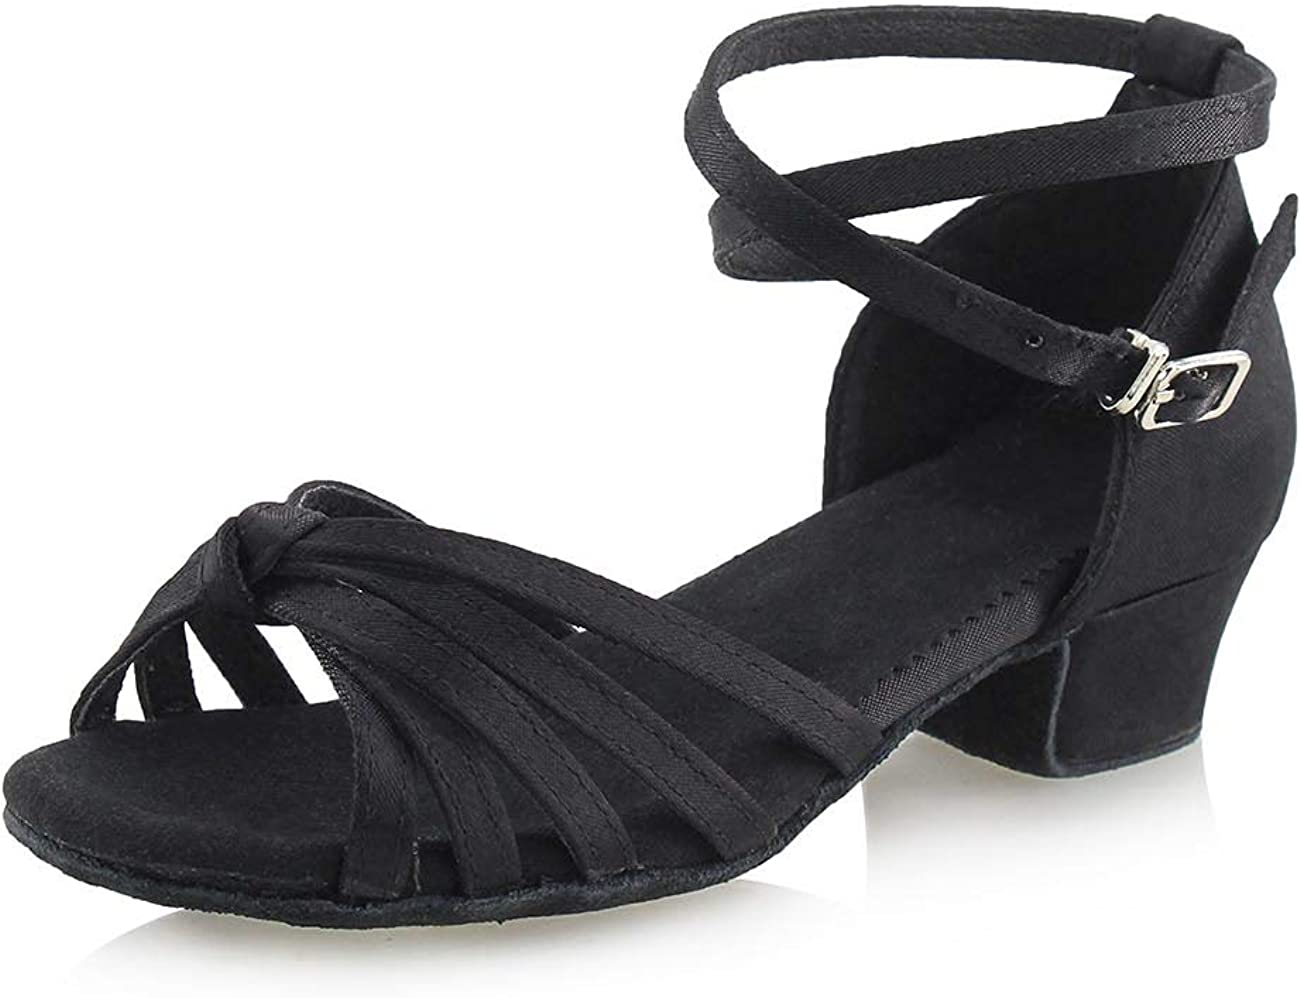 New Women Girls Ballroom Latin Tango Dance Low Heels Salsa Shoes Fashion Sandals